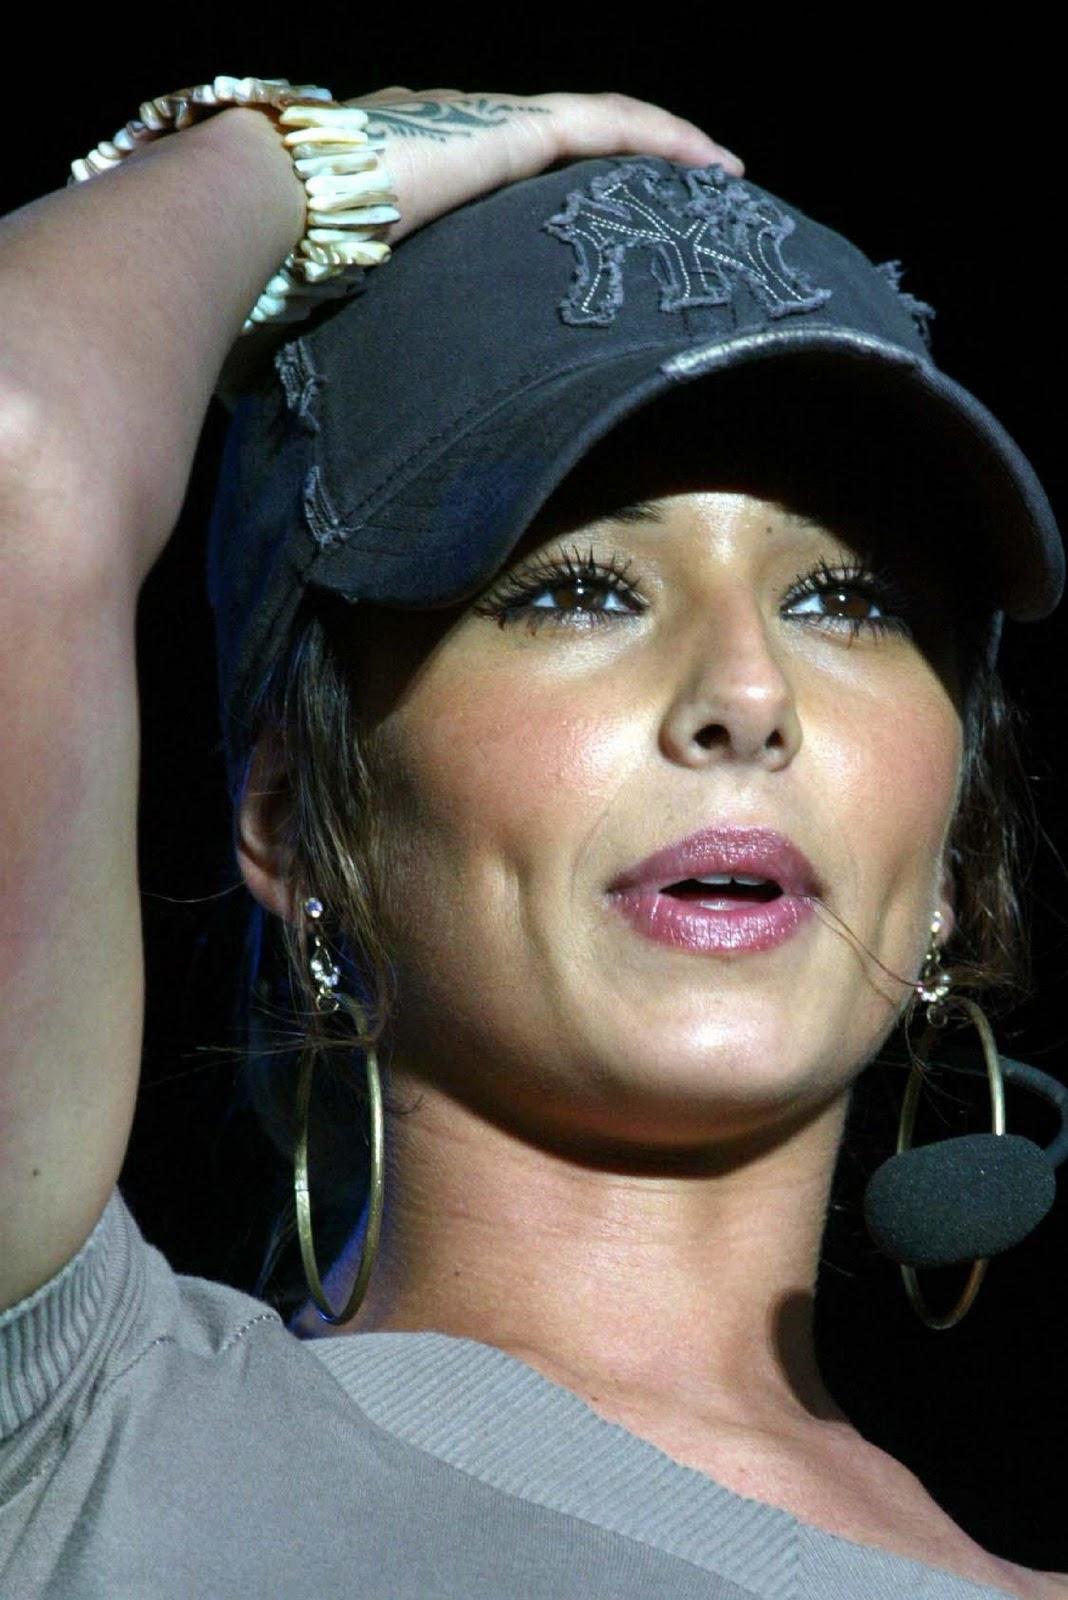 http://4.bp.blogspot.com/_GCAuqodmOE4/TT5PDjhBGuI/AAAAAAAAHg8/T6_s92LlUOM/s1600/Cheryl+Tweedy+Cole+HQ+Picture+Gallery+%252811%2529.jpg